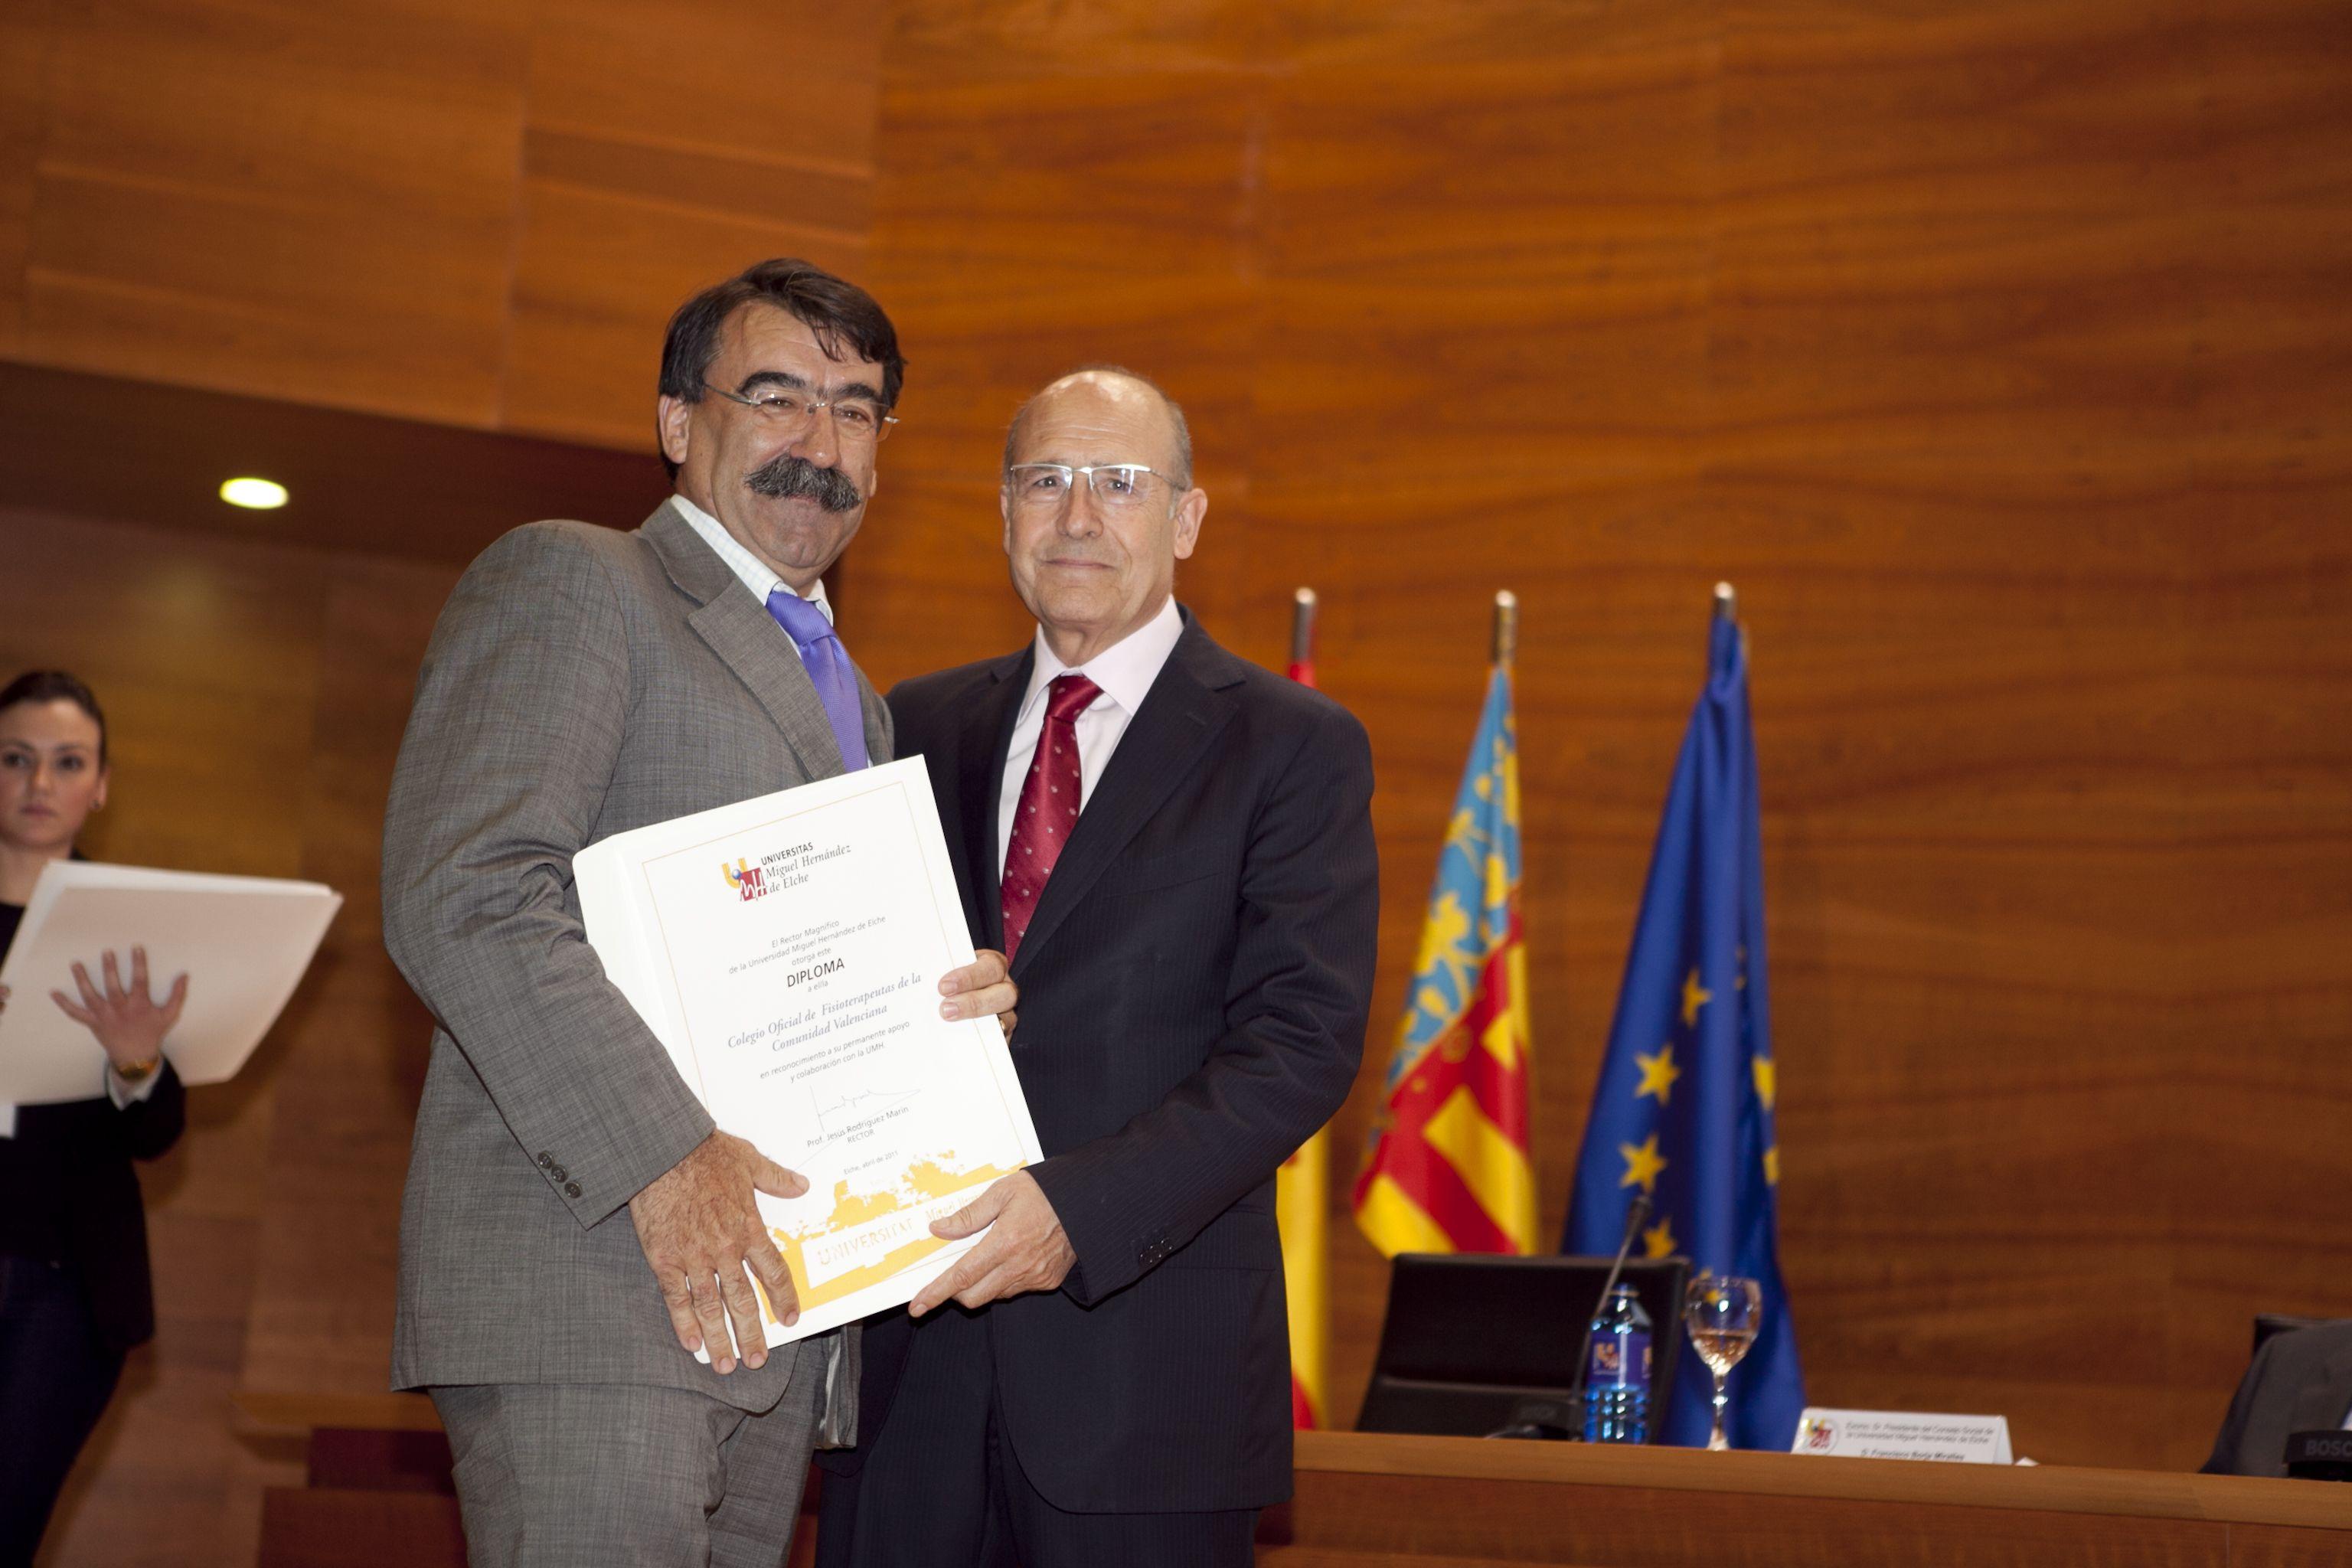 umh-diplomas-rector_mg_6912.jpg